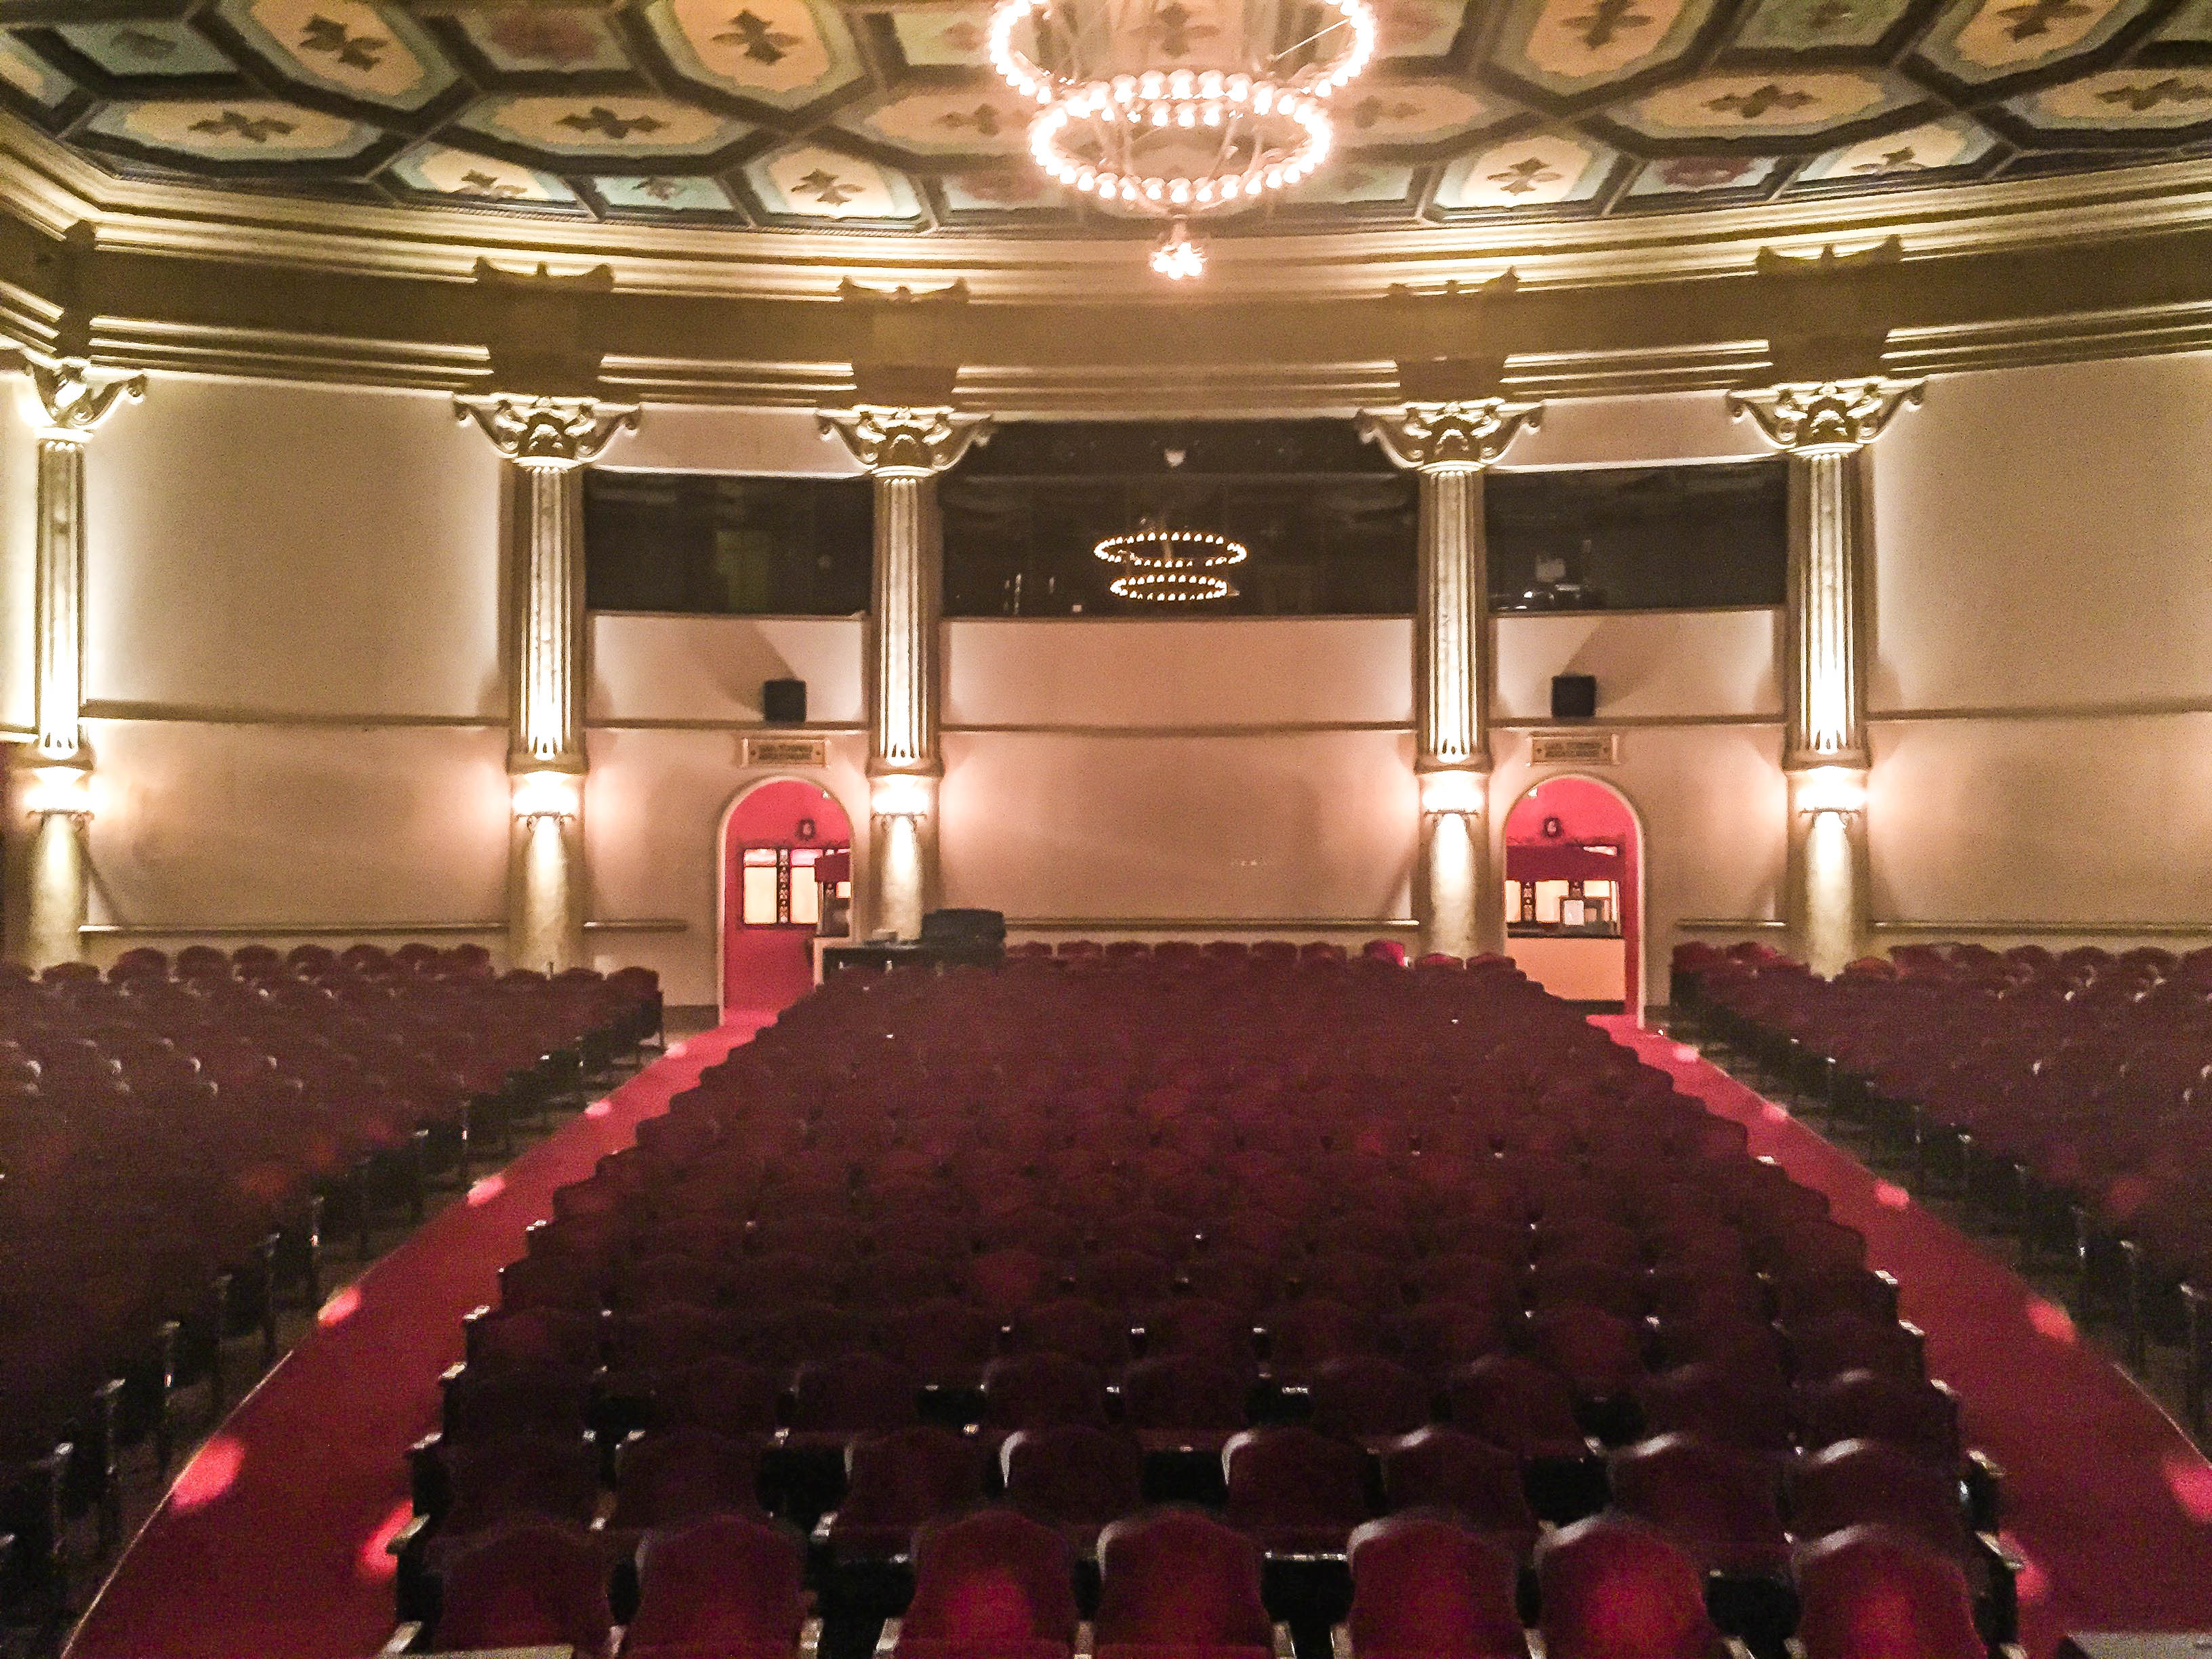 Lobero Theatre, Santa Barbara